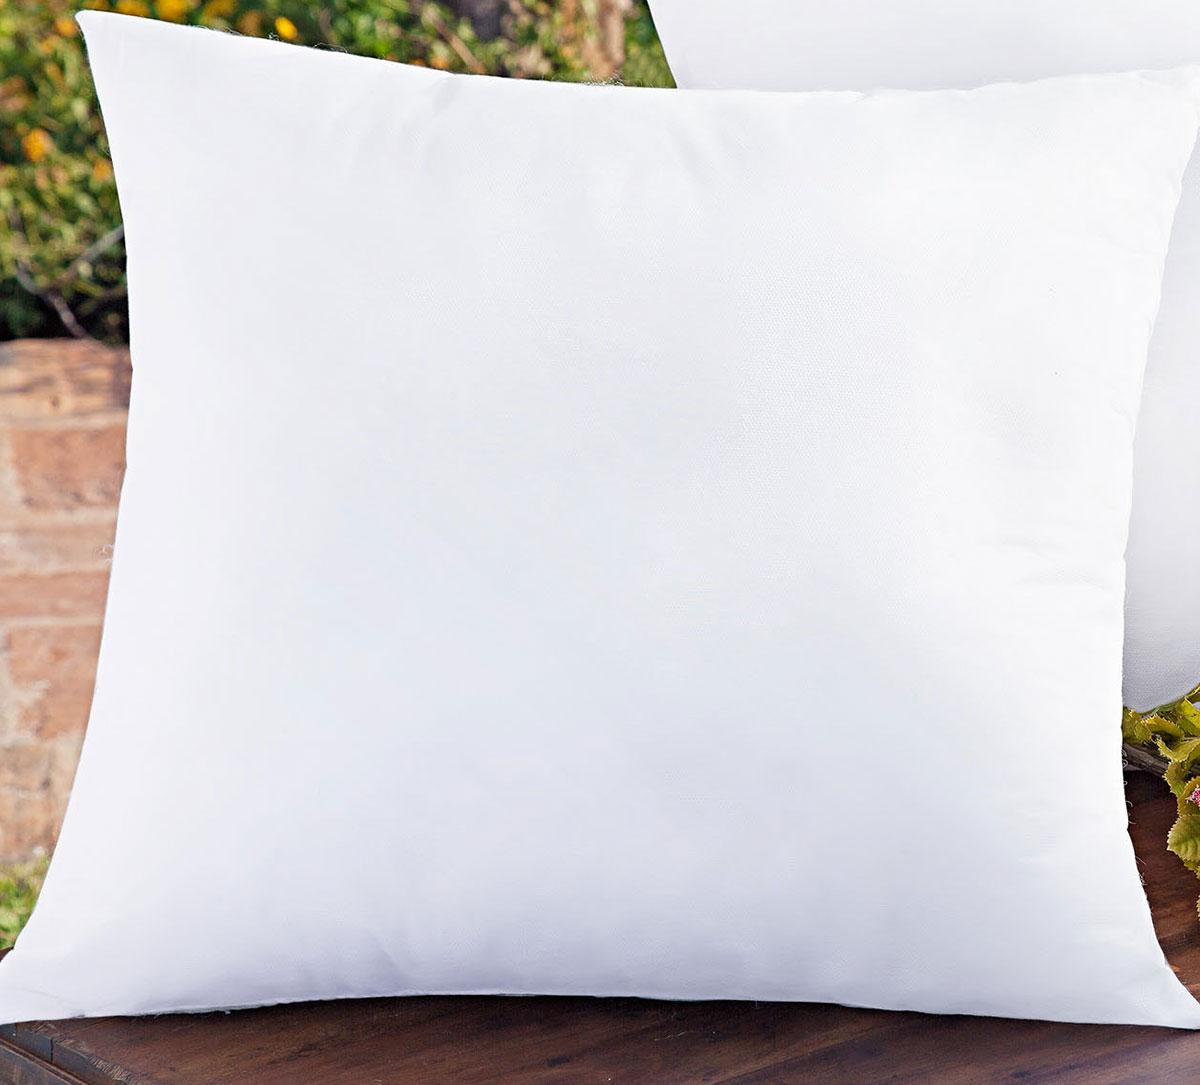 Refil de Almofada 45cm Branco Ciass 1 peças Polipropileno